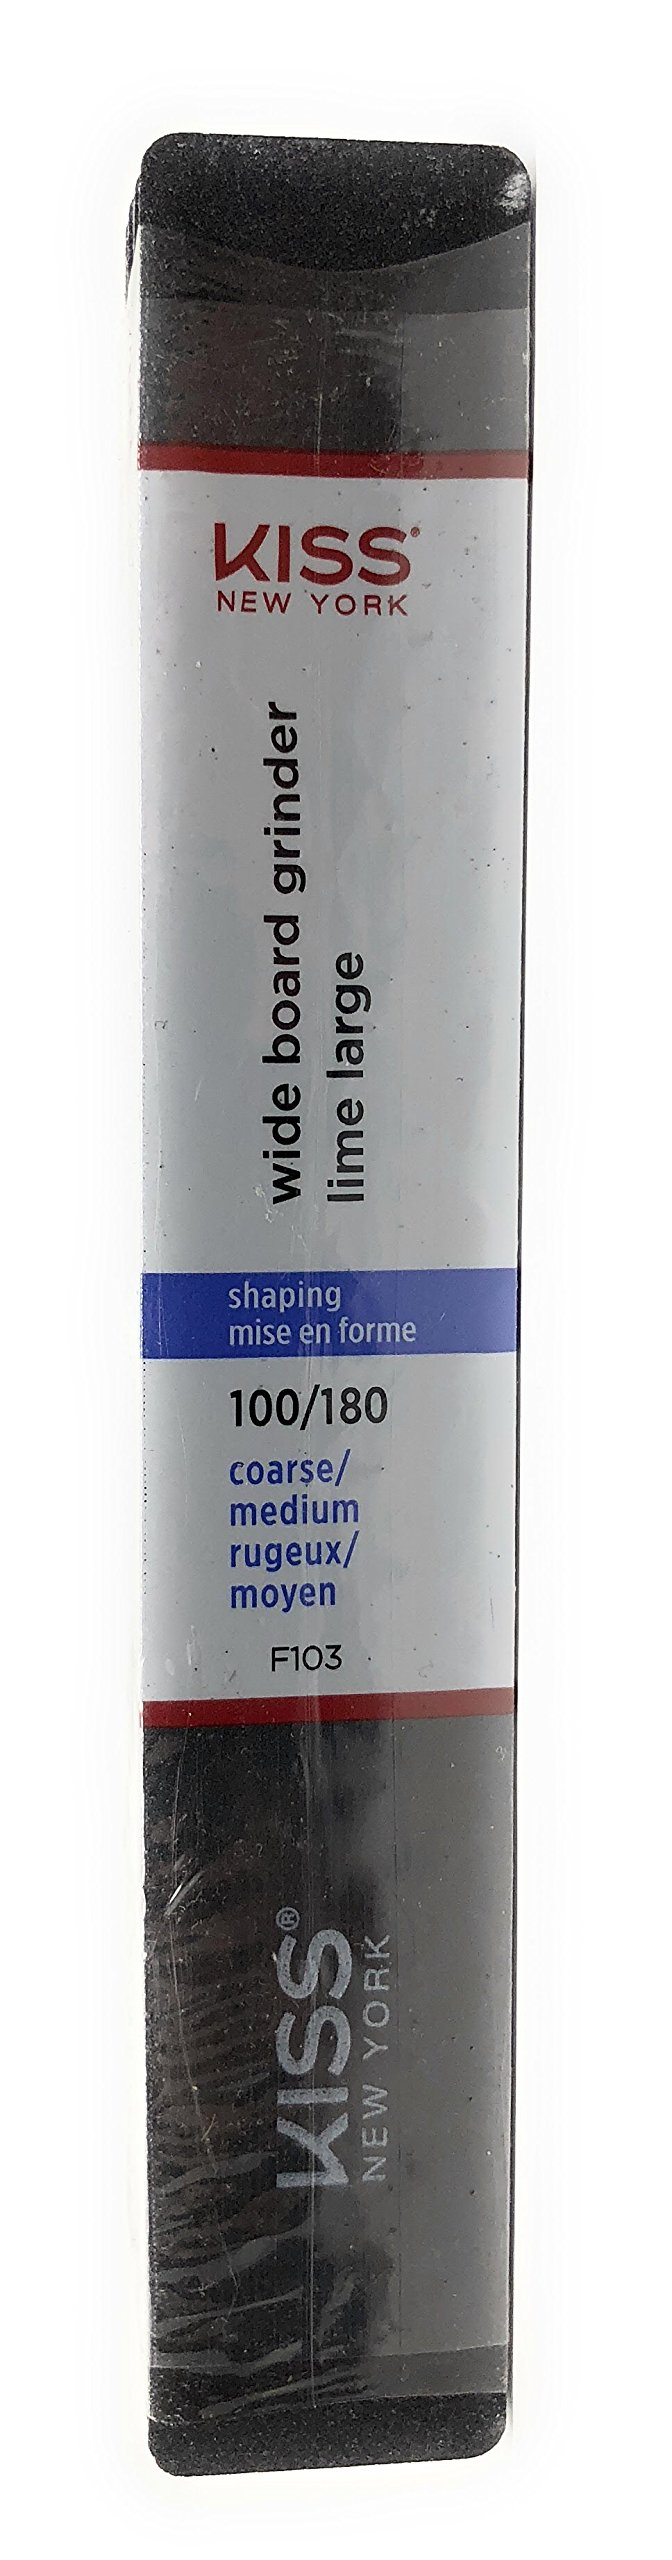 Amazon.com : Kiss Nail File 4 Way Ultra Shiner (12 pcs) : Beauty